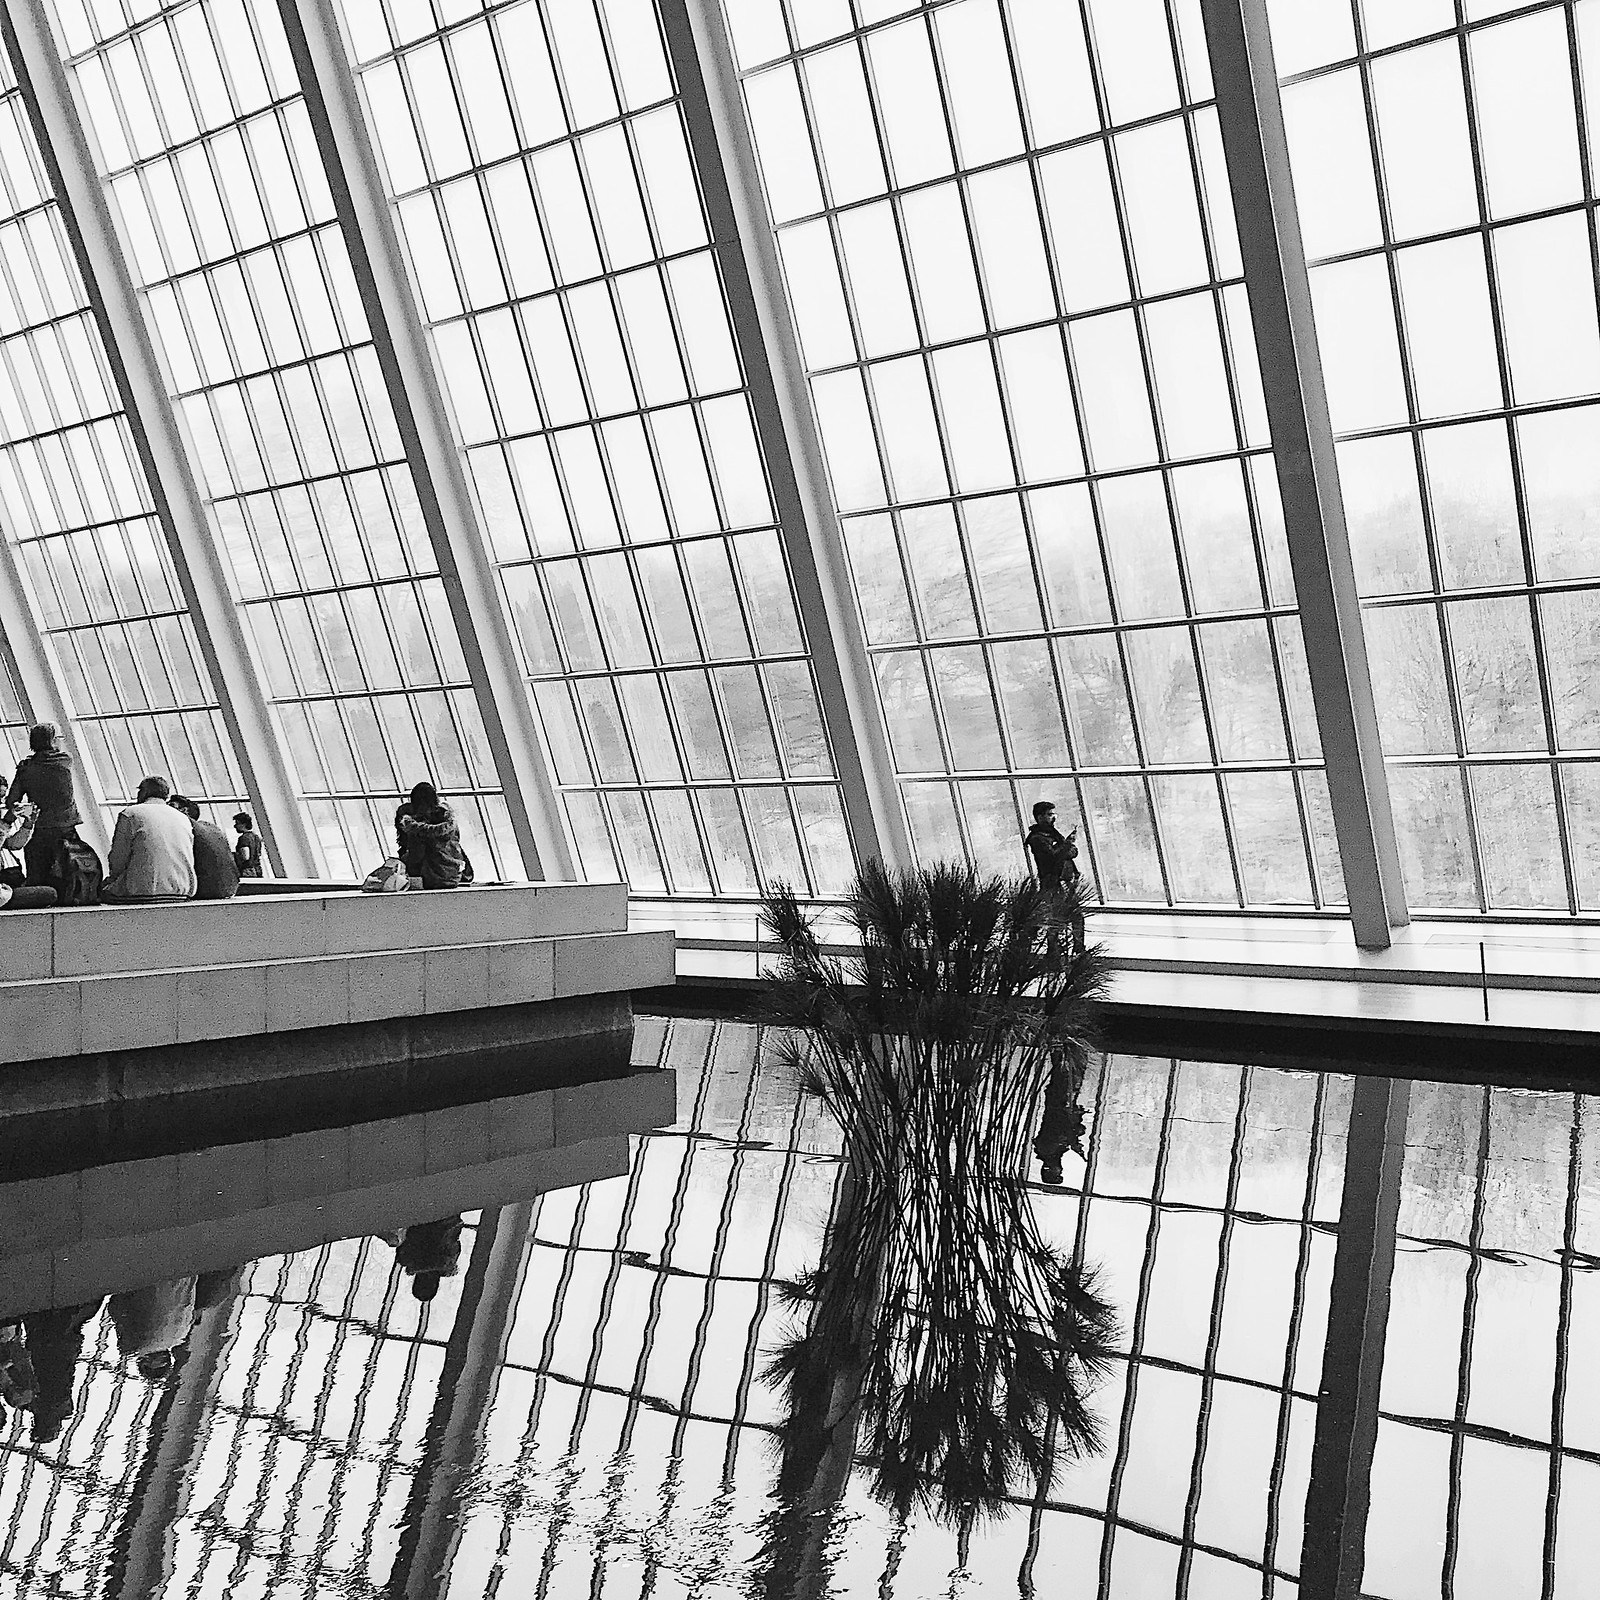 LBDD9567-metropolitanmuseum-metmuseum-metropolitan-nyc-newyork-nyfw-newyorkfashionweek-newyorkcity-clothestoyouuu-elizabeeetht